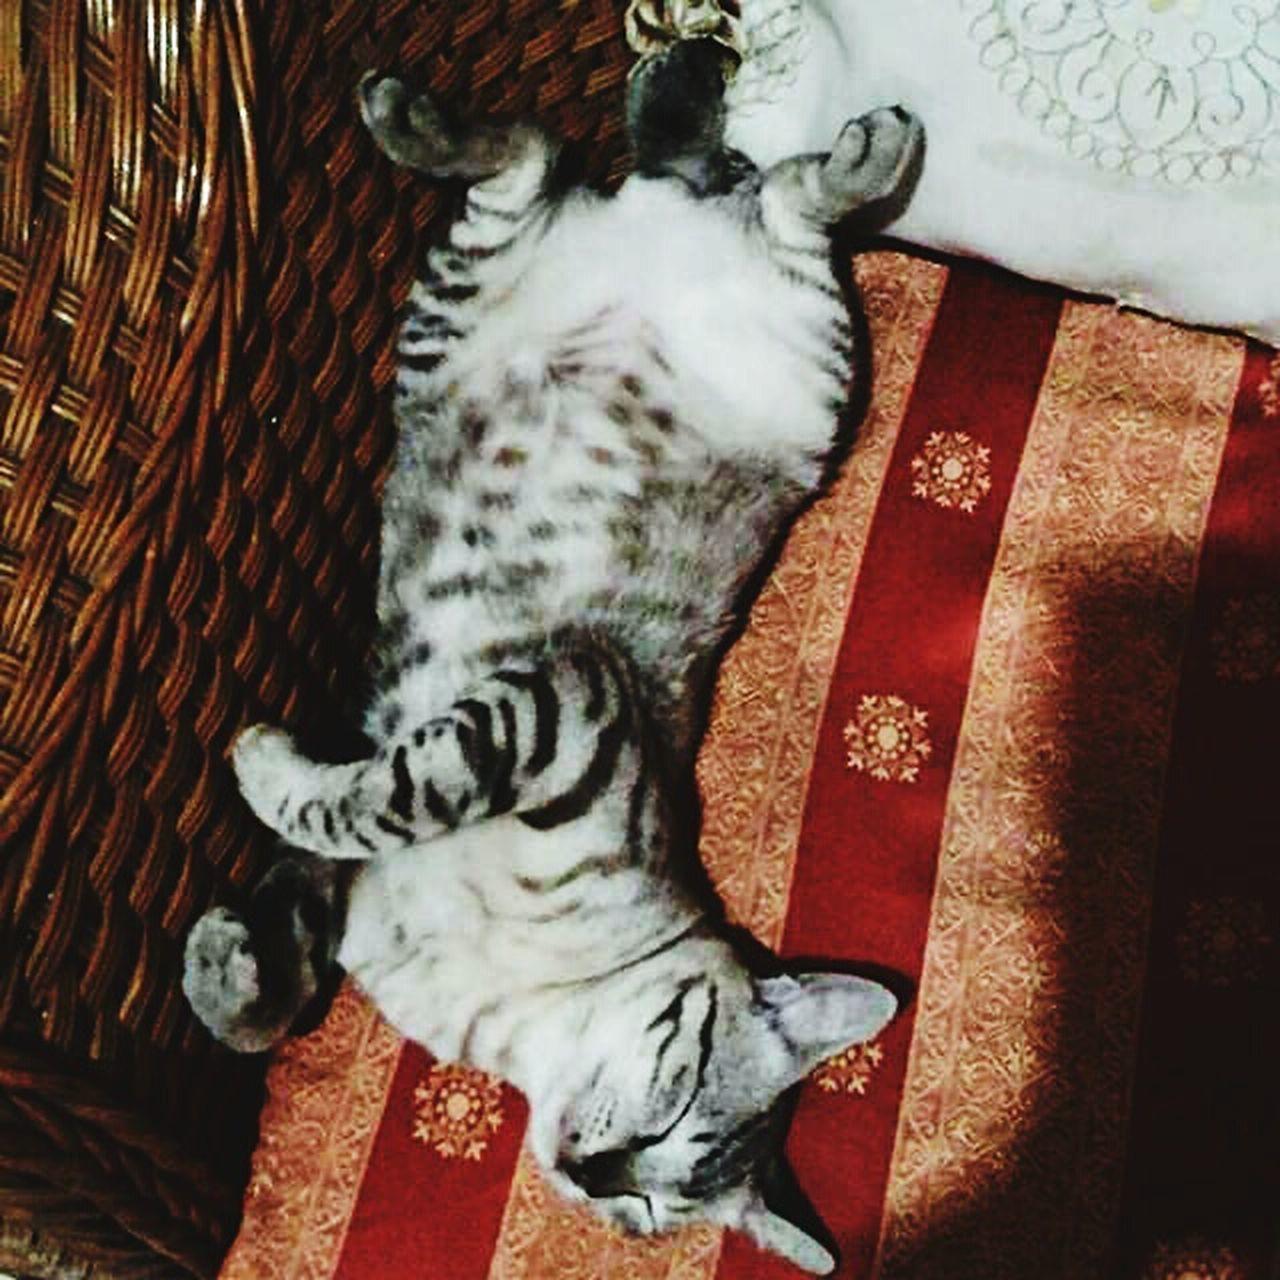 Cute Cats (>^ω^<) Weird Sleep Position Animal Photography